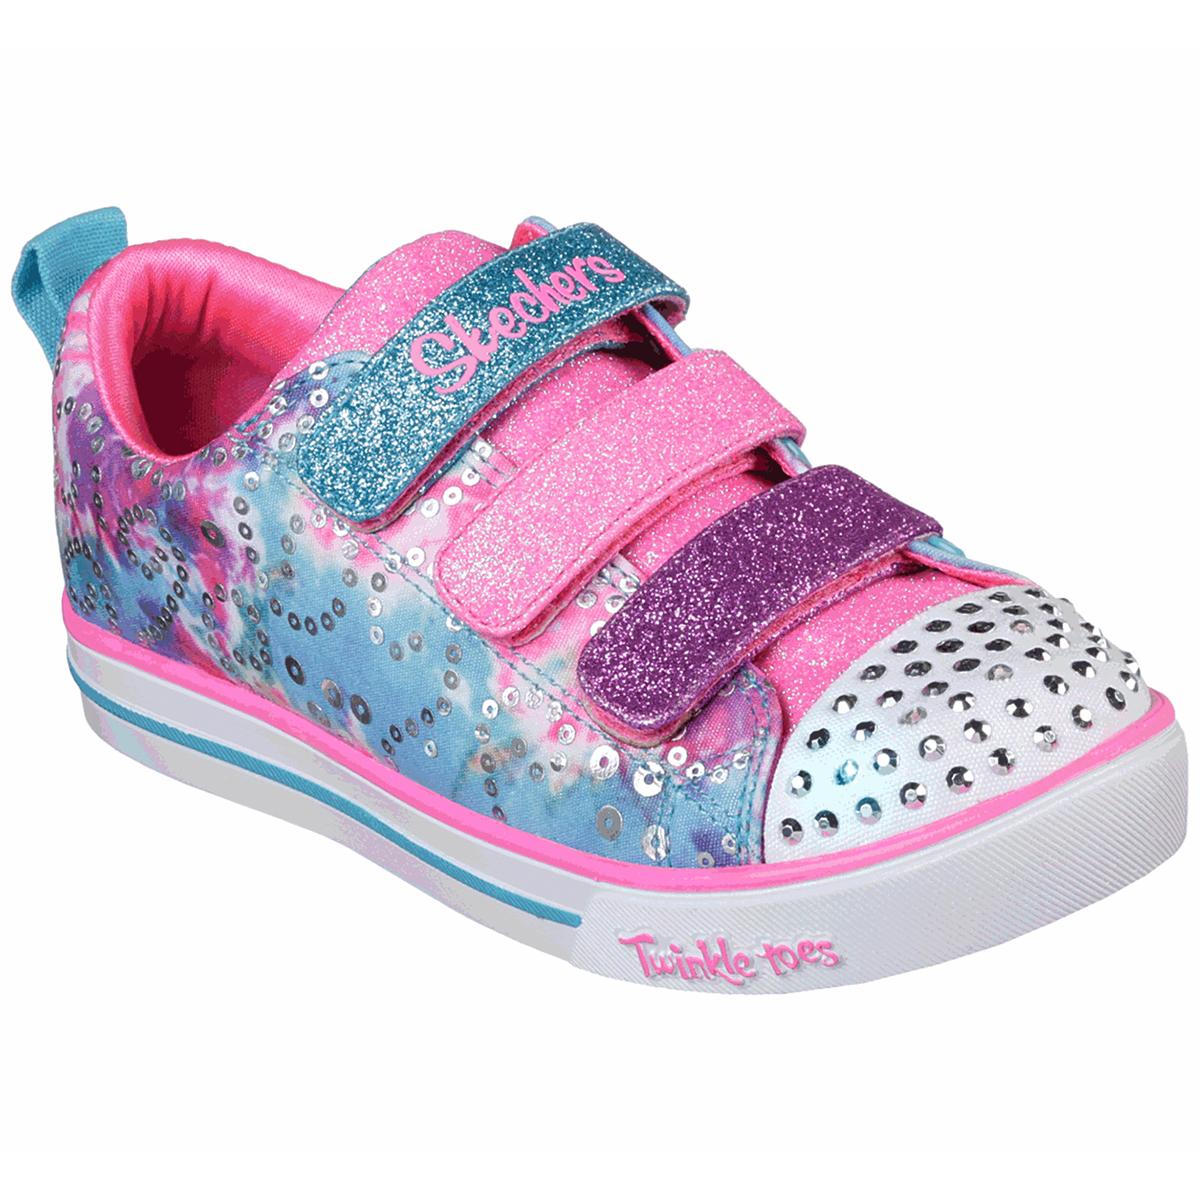 Skechers Little Girls' Sparkle Lite Sneakers - Various Patterns, 1.5